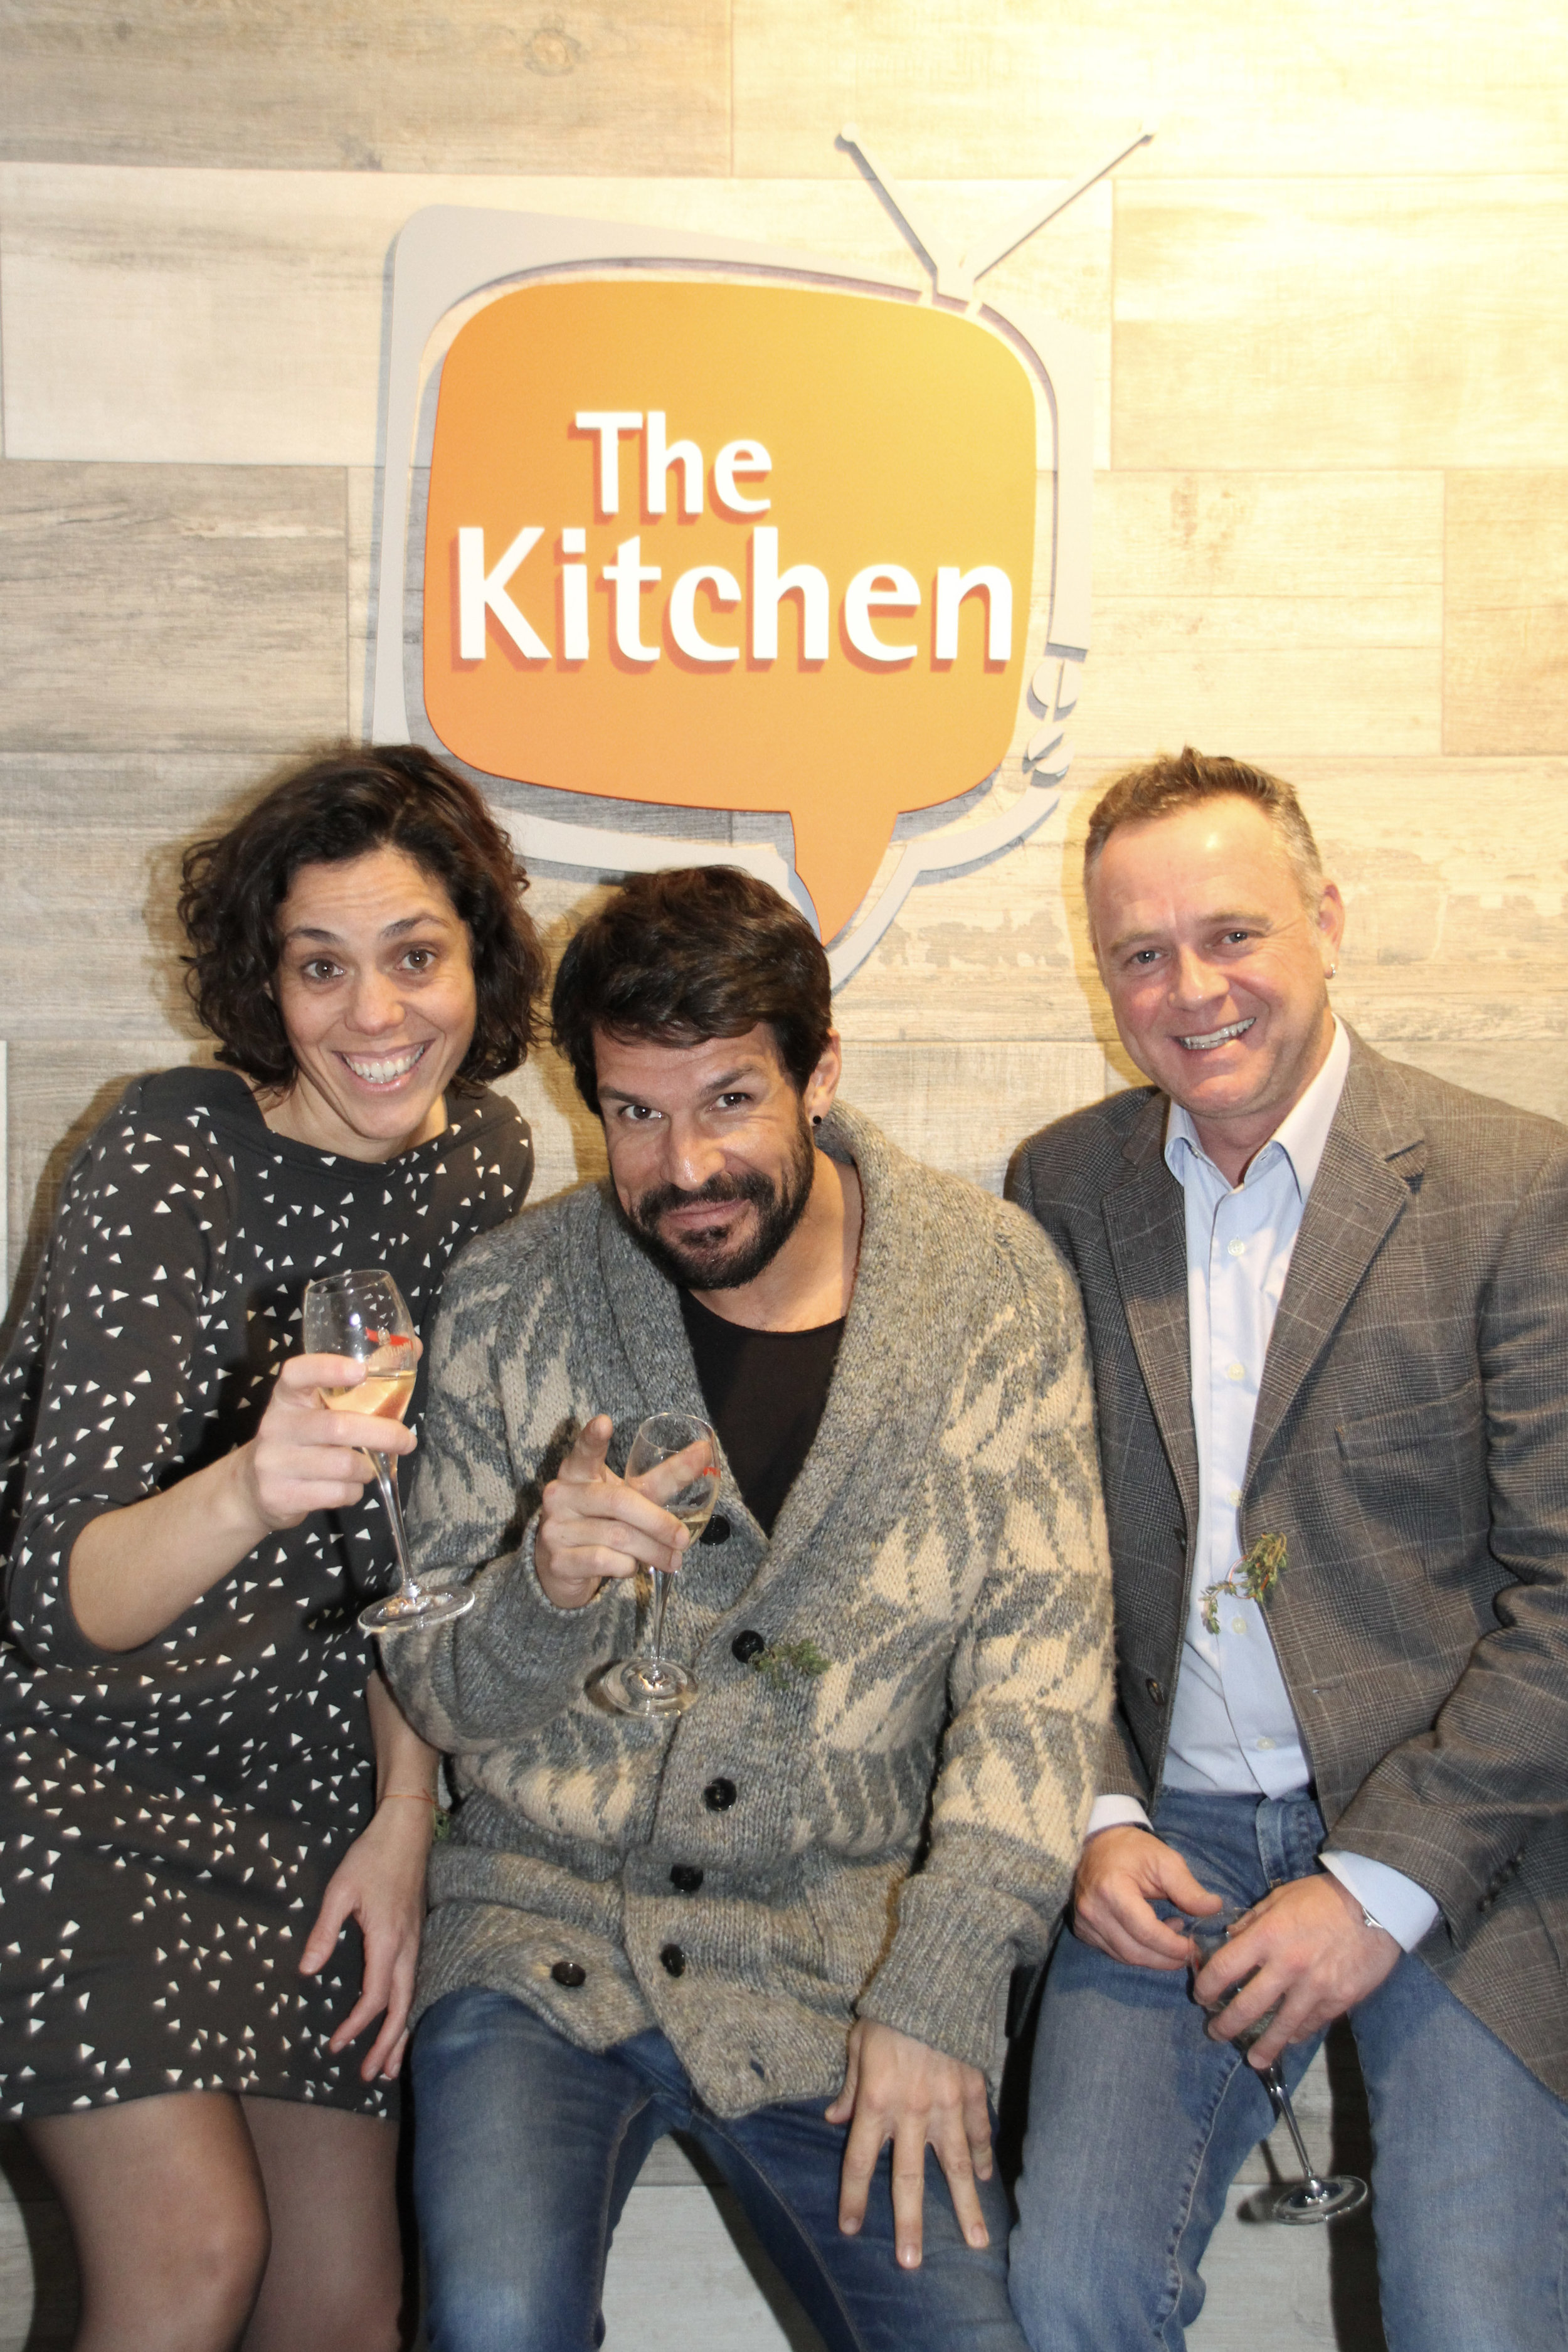 Ainhoa Martin (The Kitchen), Fran Jimenez (Dubbing Actor), Jesus Pinillos (Dubbing Director and Actor)